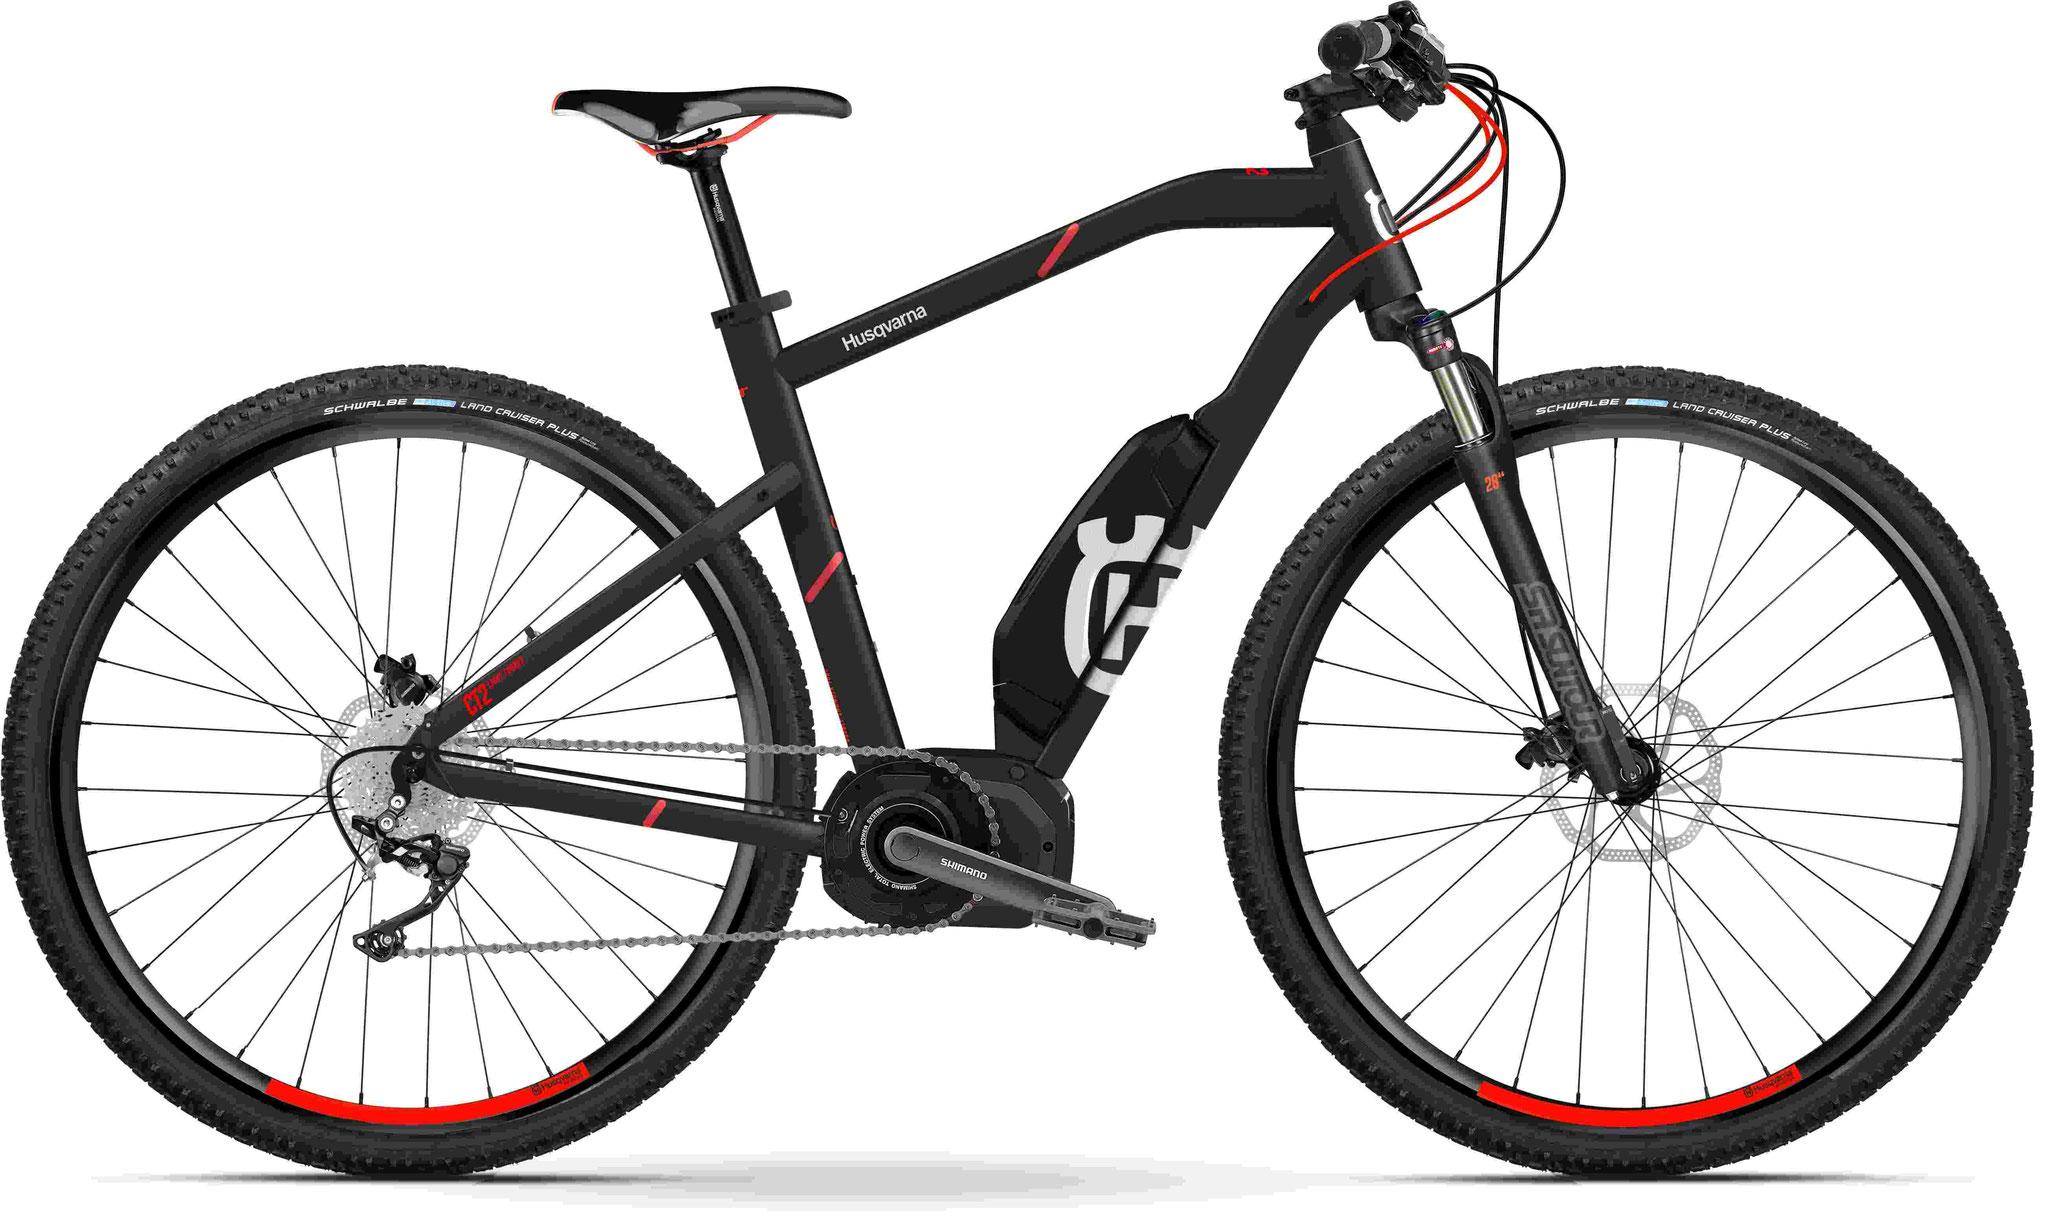 Husqvarna Cross Tourer CT2 e-Mountainbike, MTB Pedelec 2018 schwarz/rot Diamantrahmen